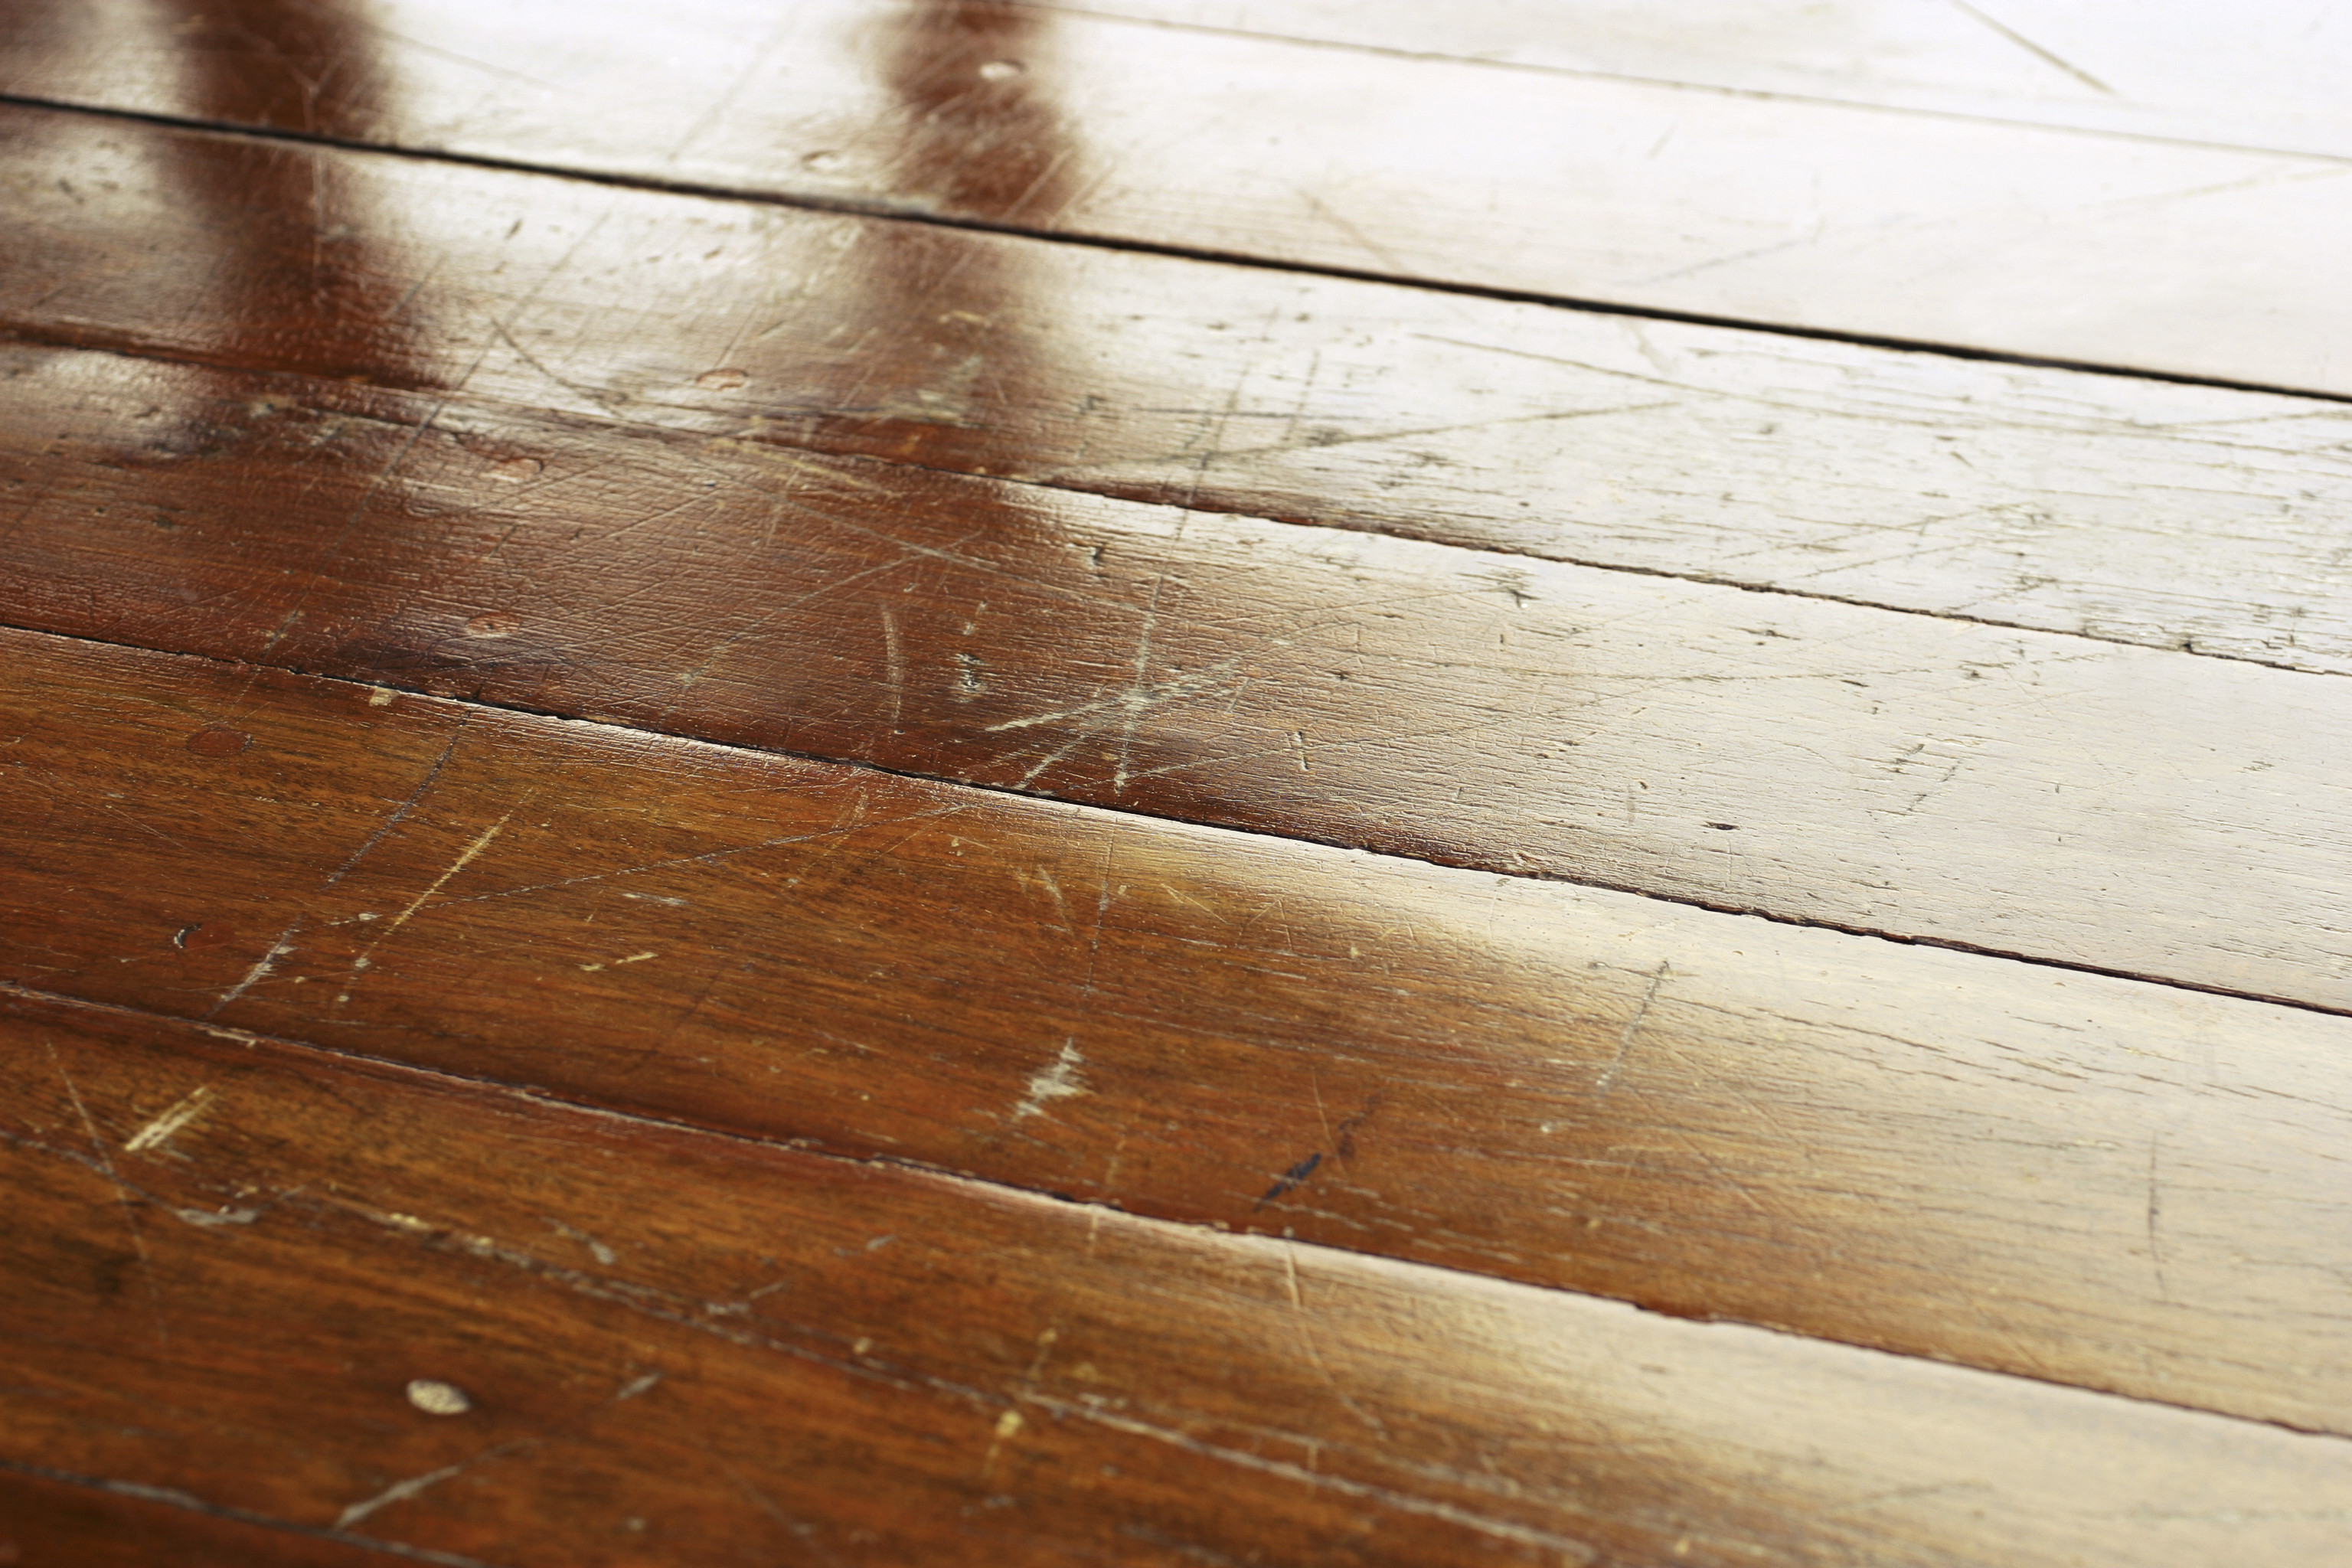 bona hardwood floor cleaning machine of refinishing old hardwood floors hardwood floor cleaning how to intended for refinishing old hardwood floors hardwood floor cleaning how to polyurethane wood floors sanding